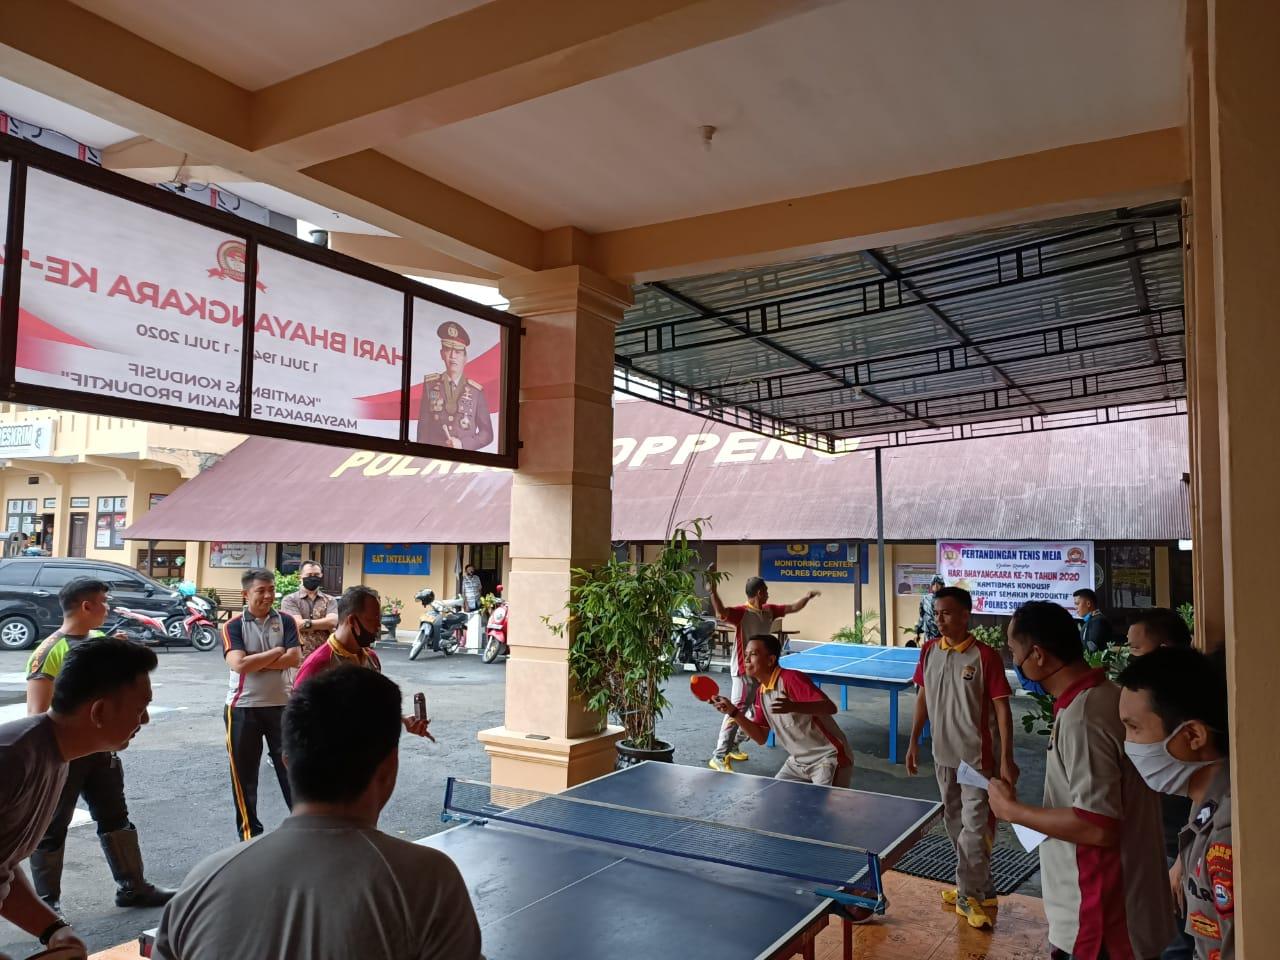 Polres Soppeng Gelar Lomba Seni dan Tennis Meja dalam Memeriahkan Hari Bhayangkara ke- 74